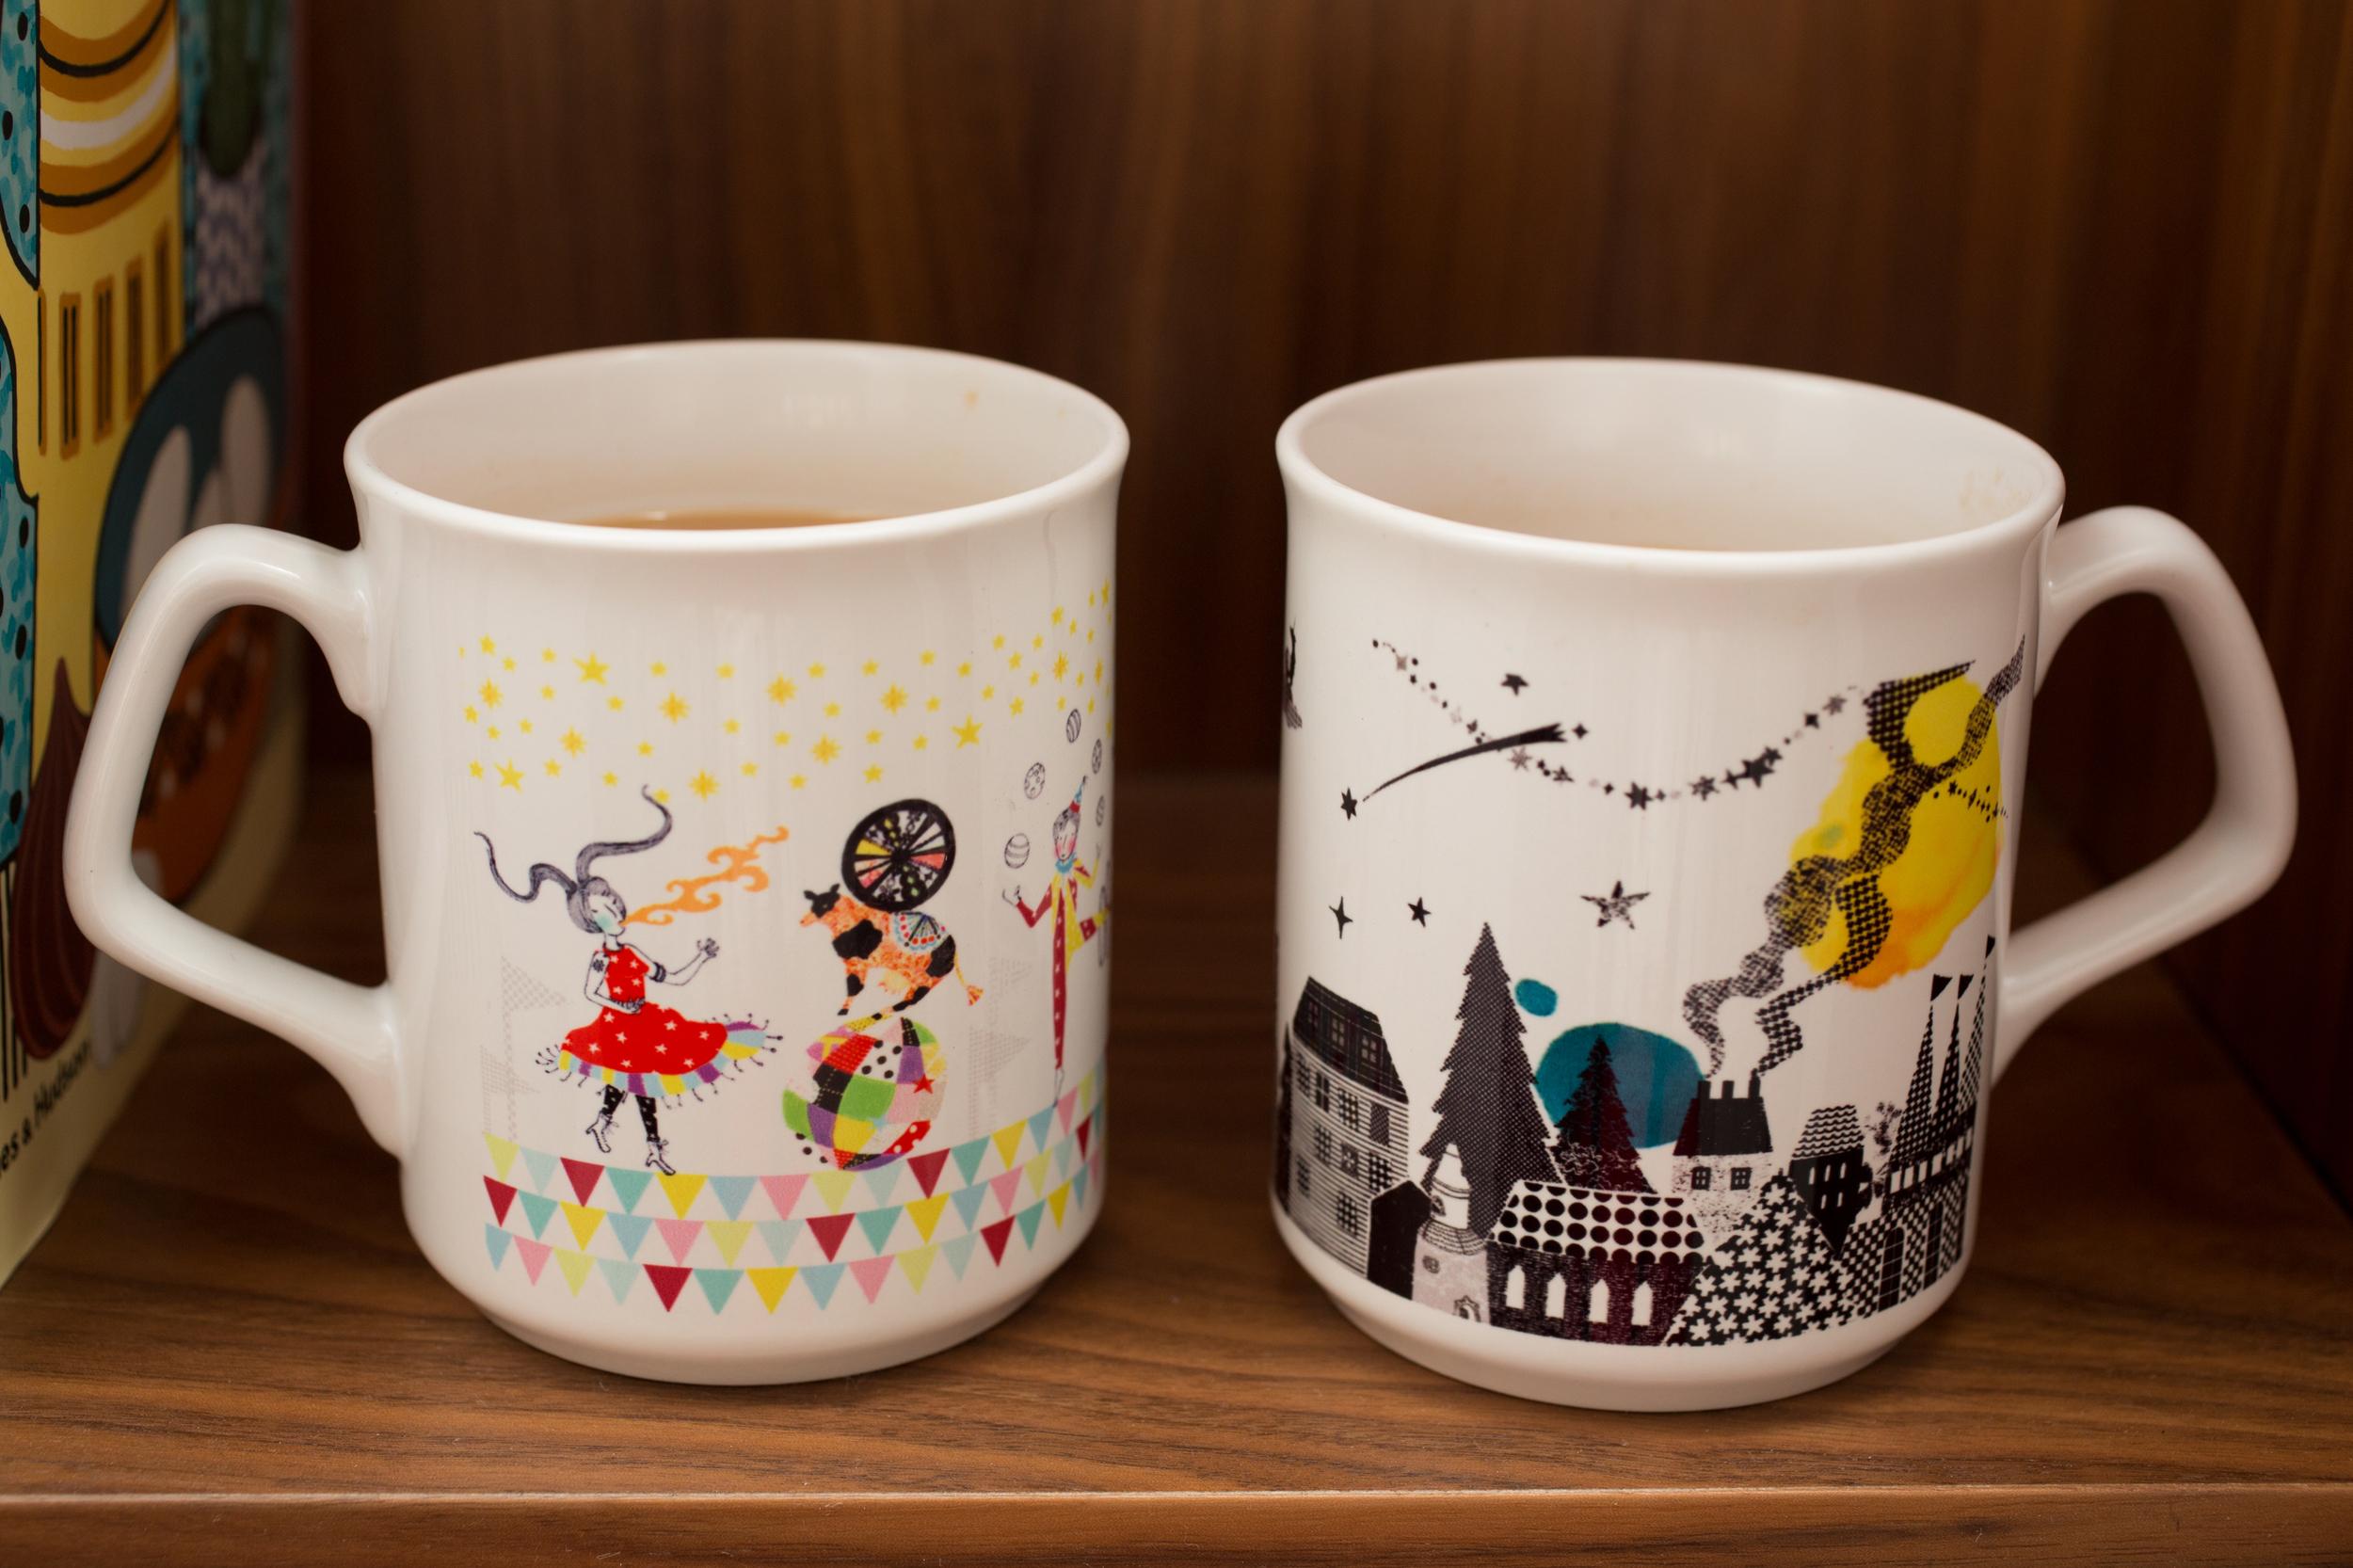 Mugs by Sas & Yosh